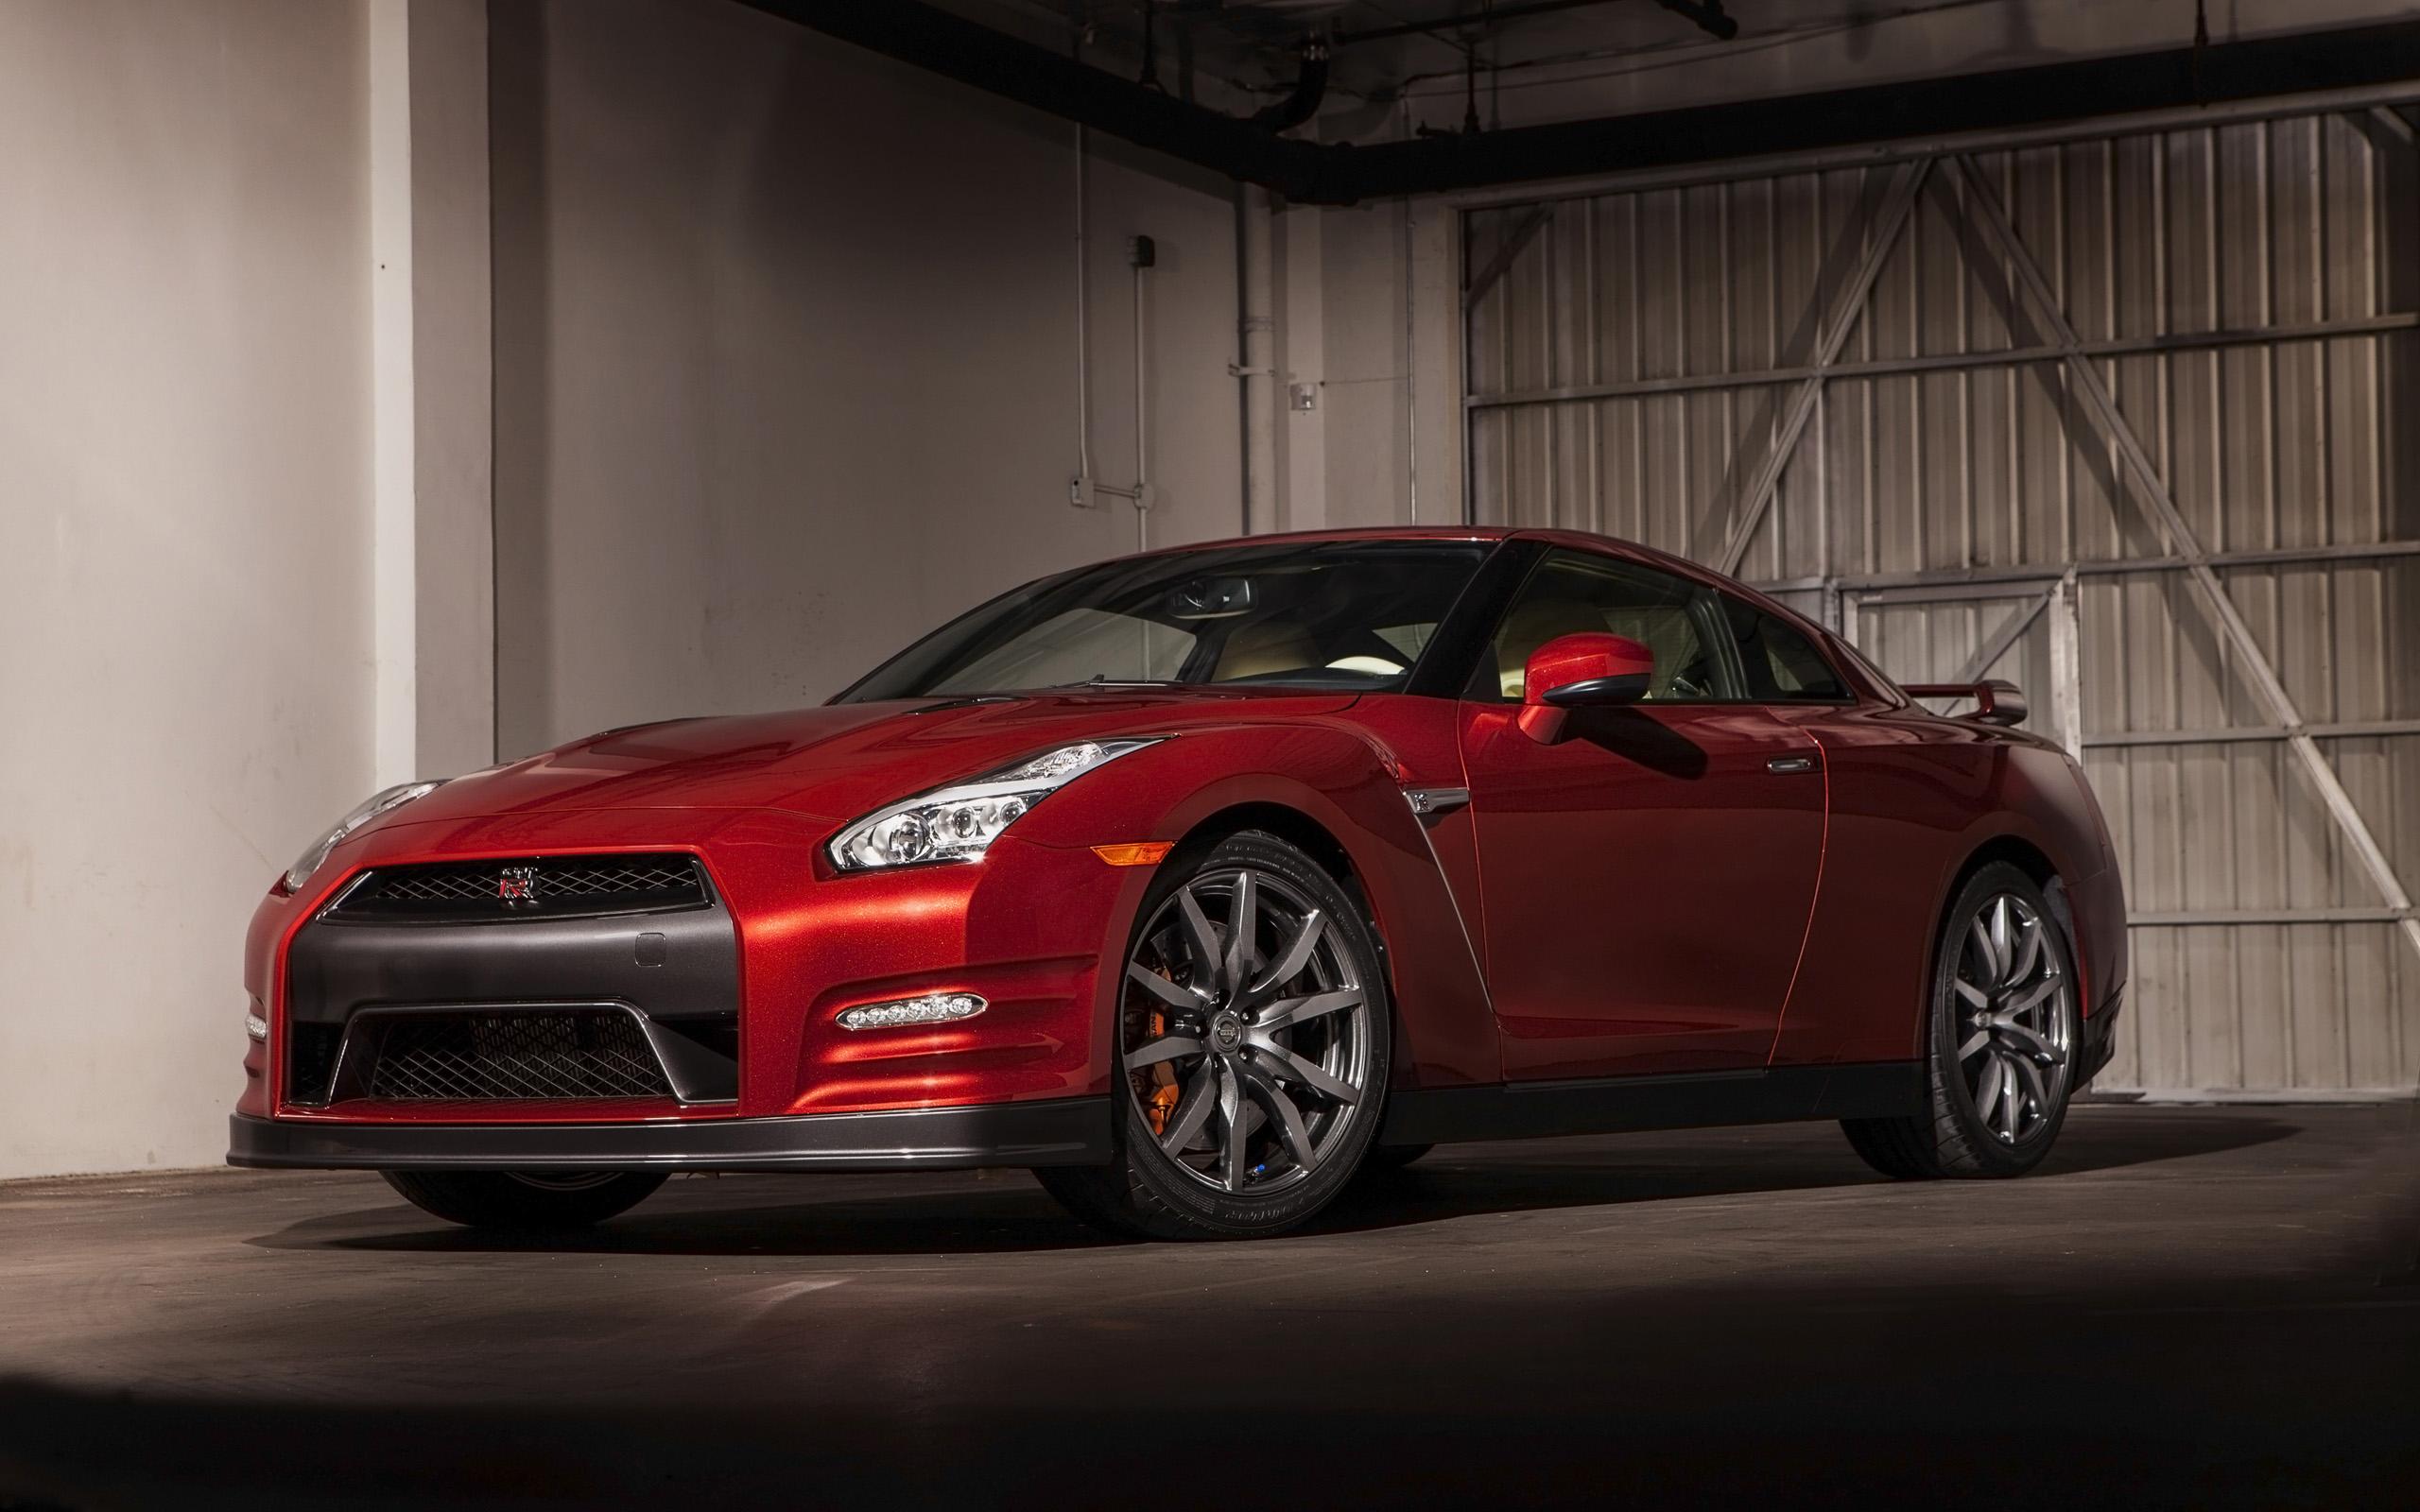 2015 Nissan GT R Wallpaper HD Car Wallpapers 2560x1600